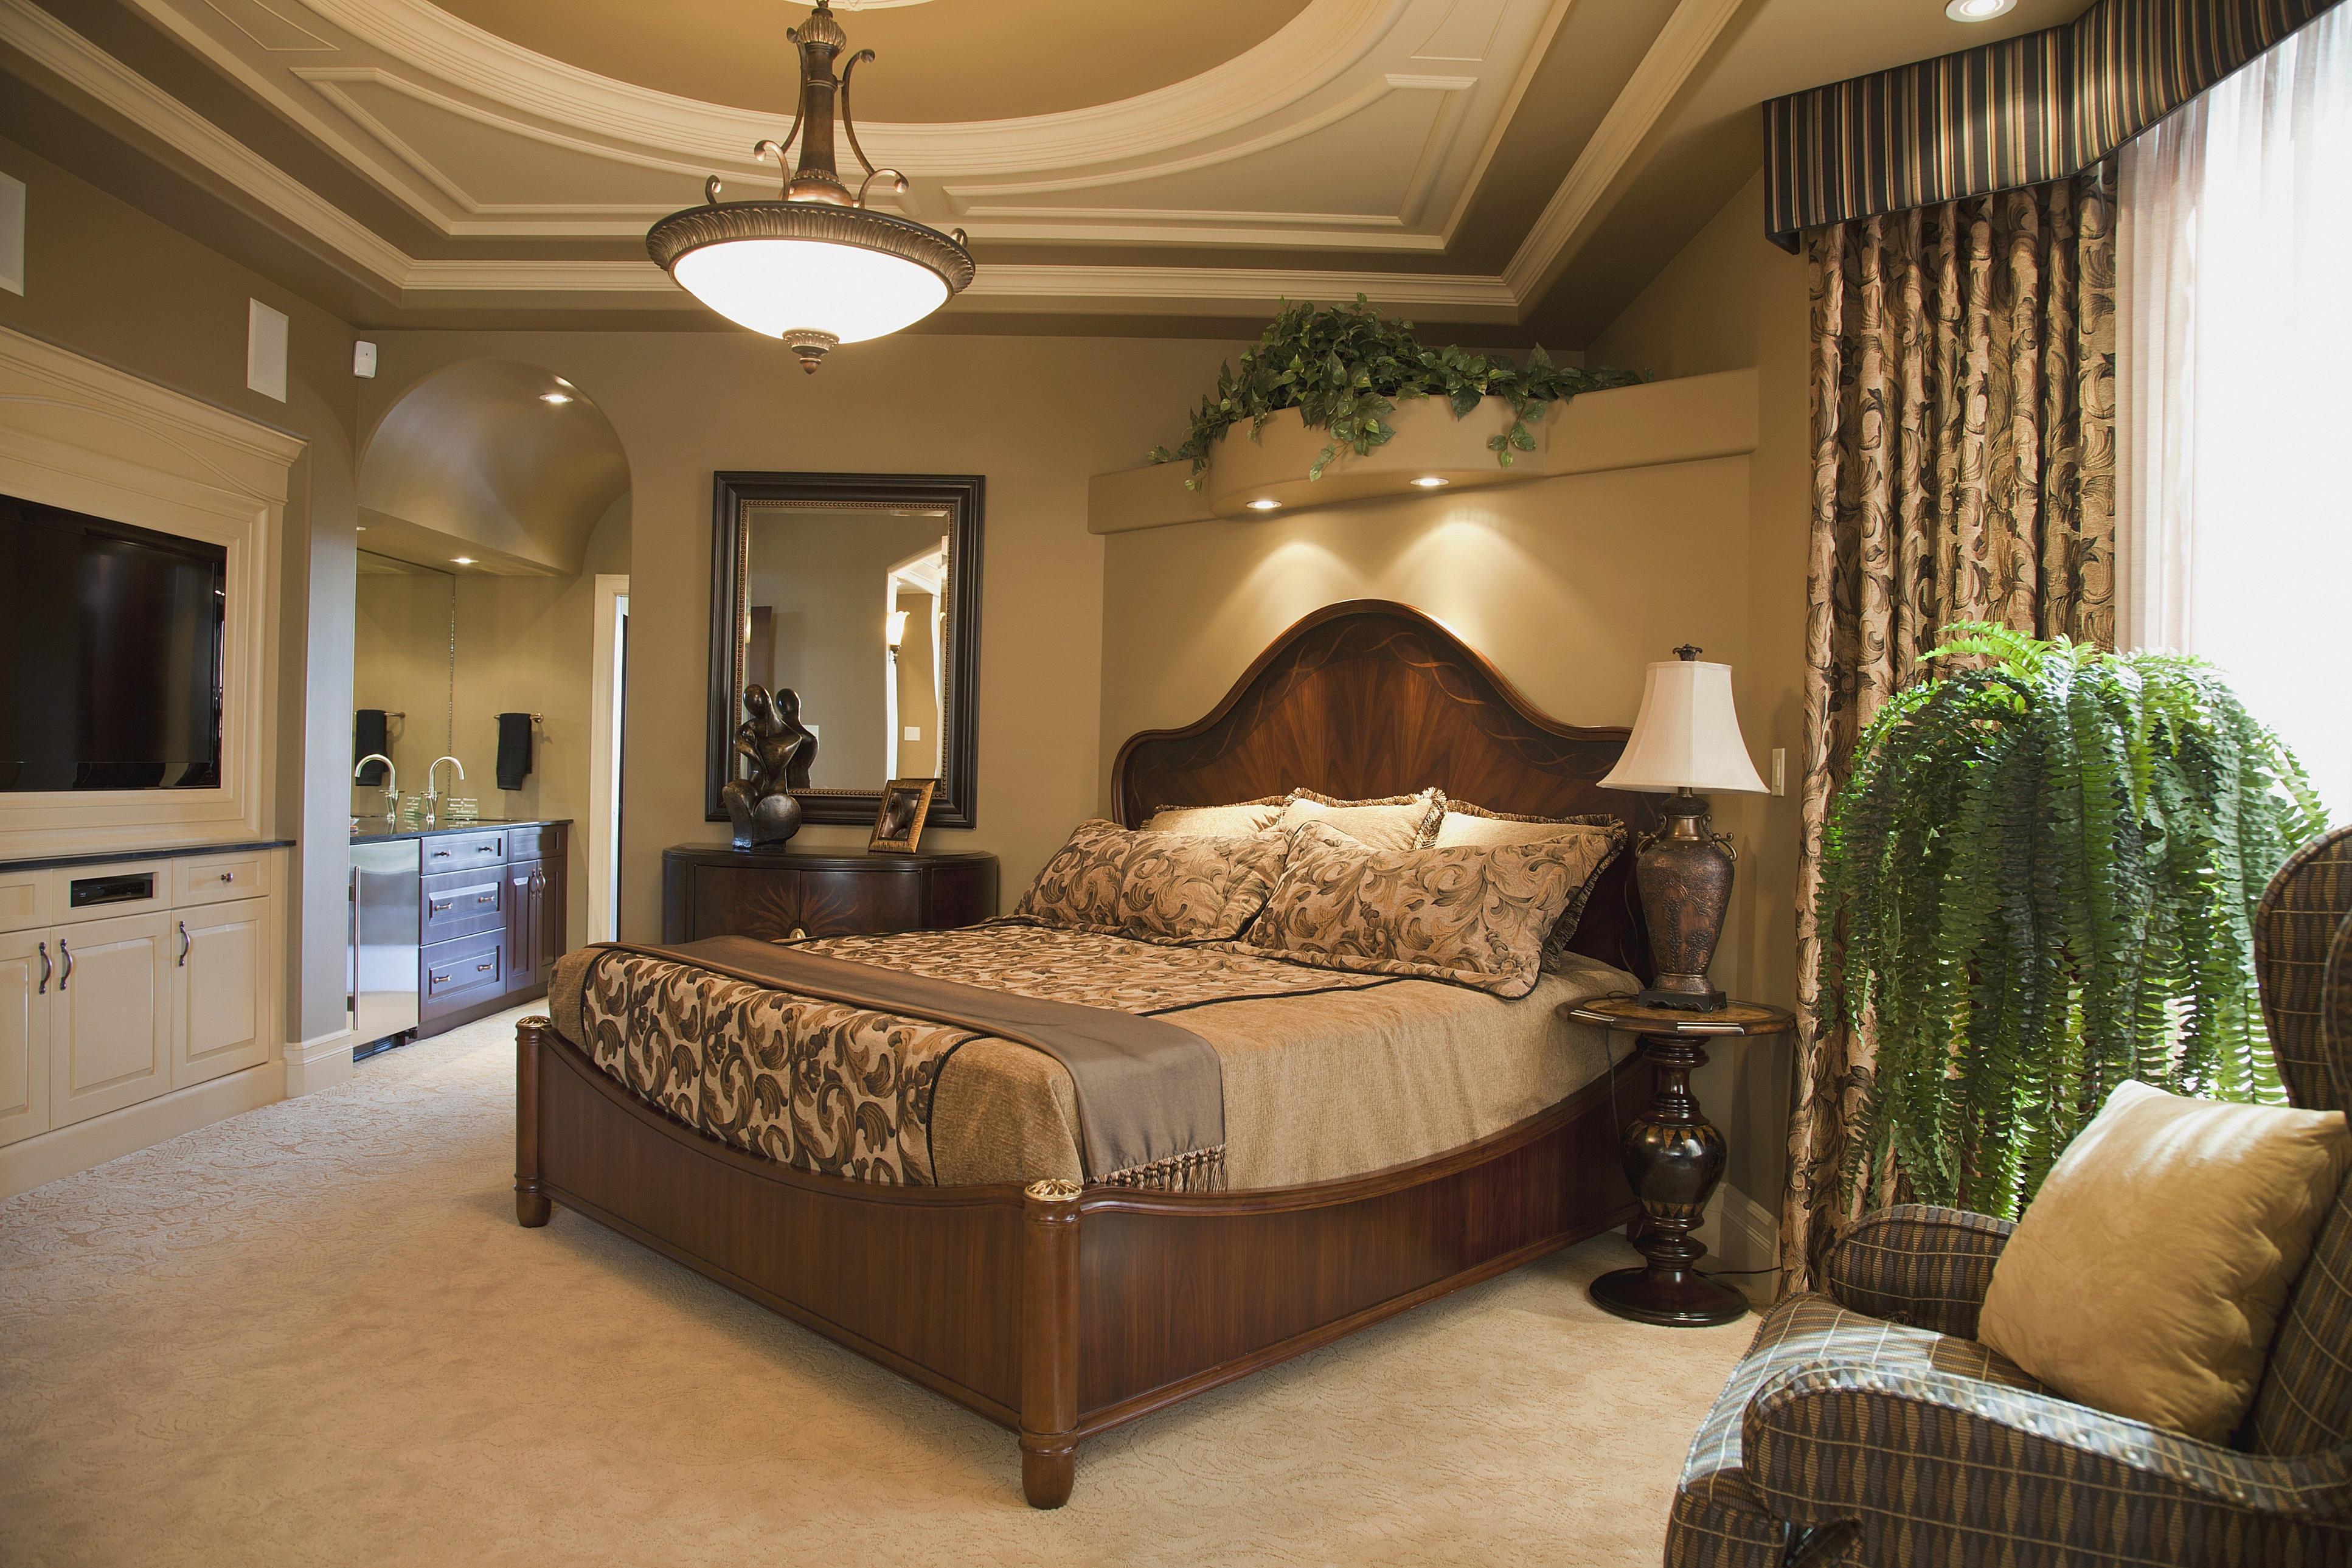 Tuscan Bedroom Decorating Ideas and Photos on Room Decor Ideas  id=99638